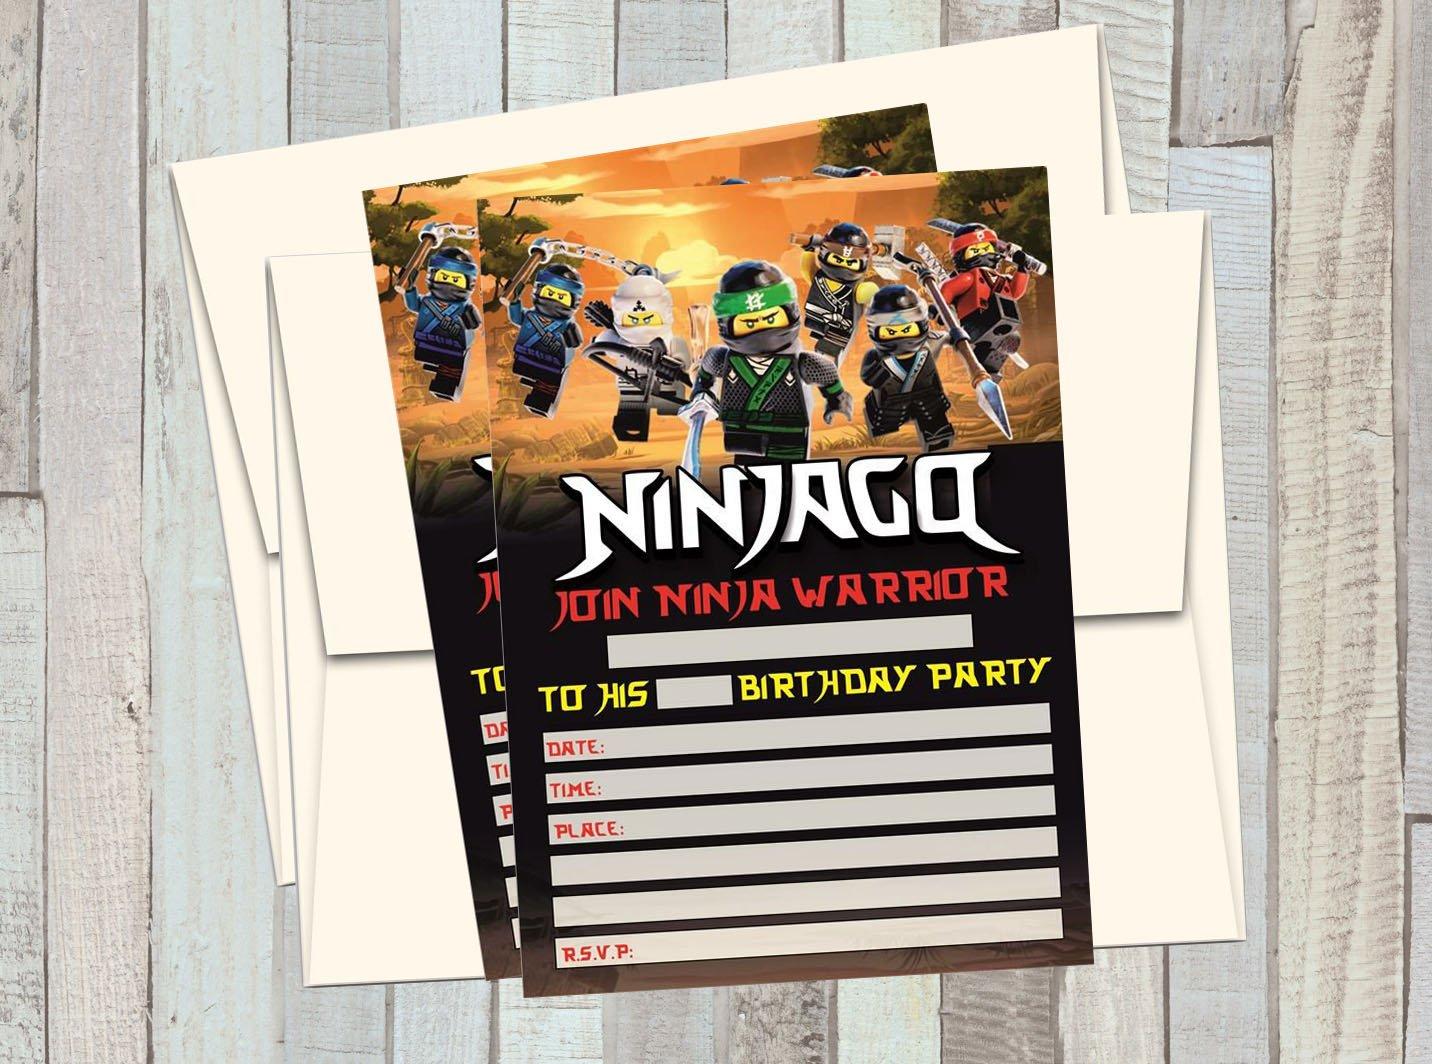 12 Ninjago Movie - Birthday Invitations (12 5x7in Cards, 12 Matching White envelopes)